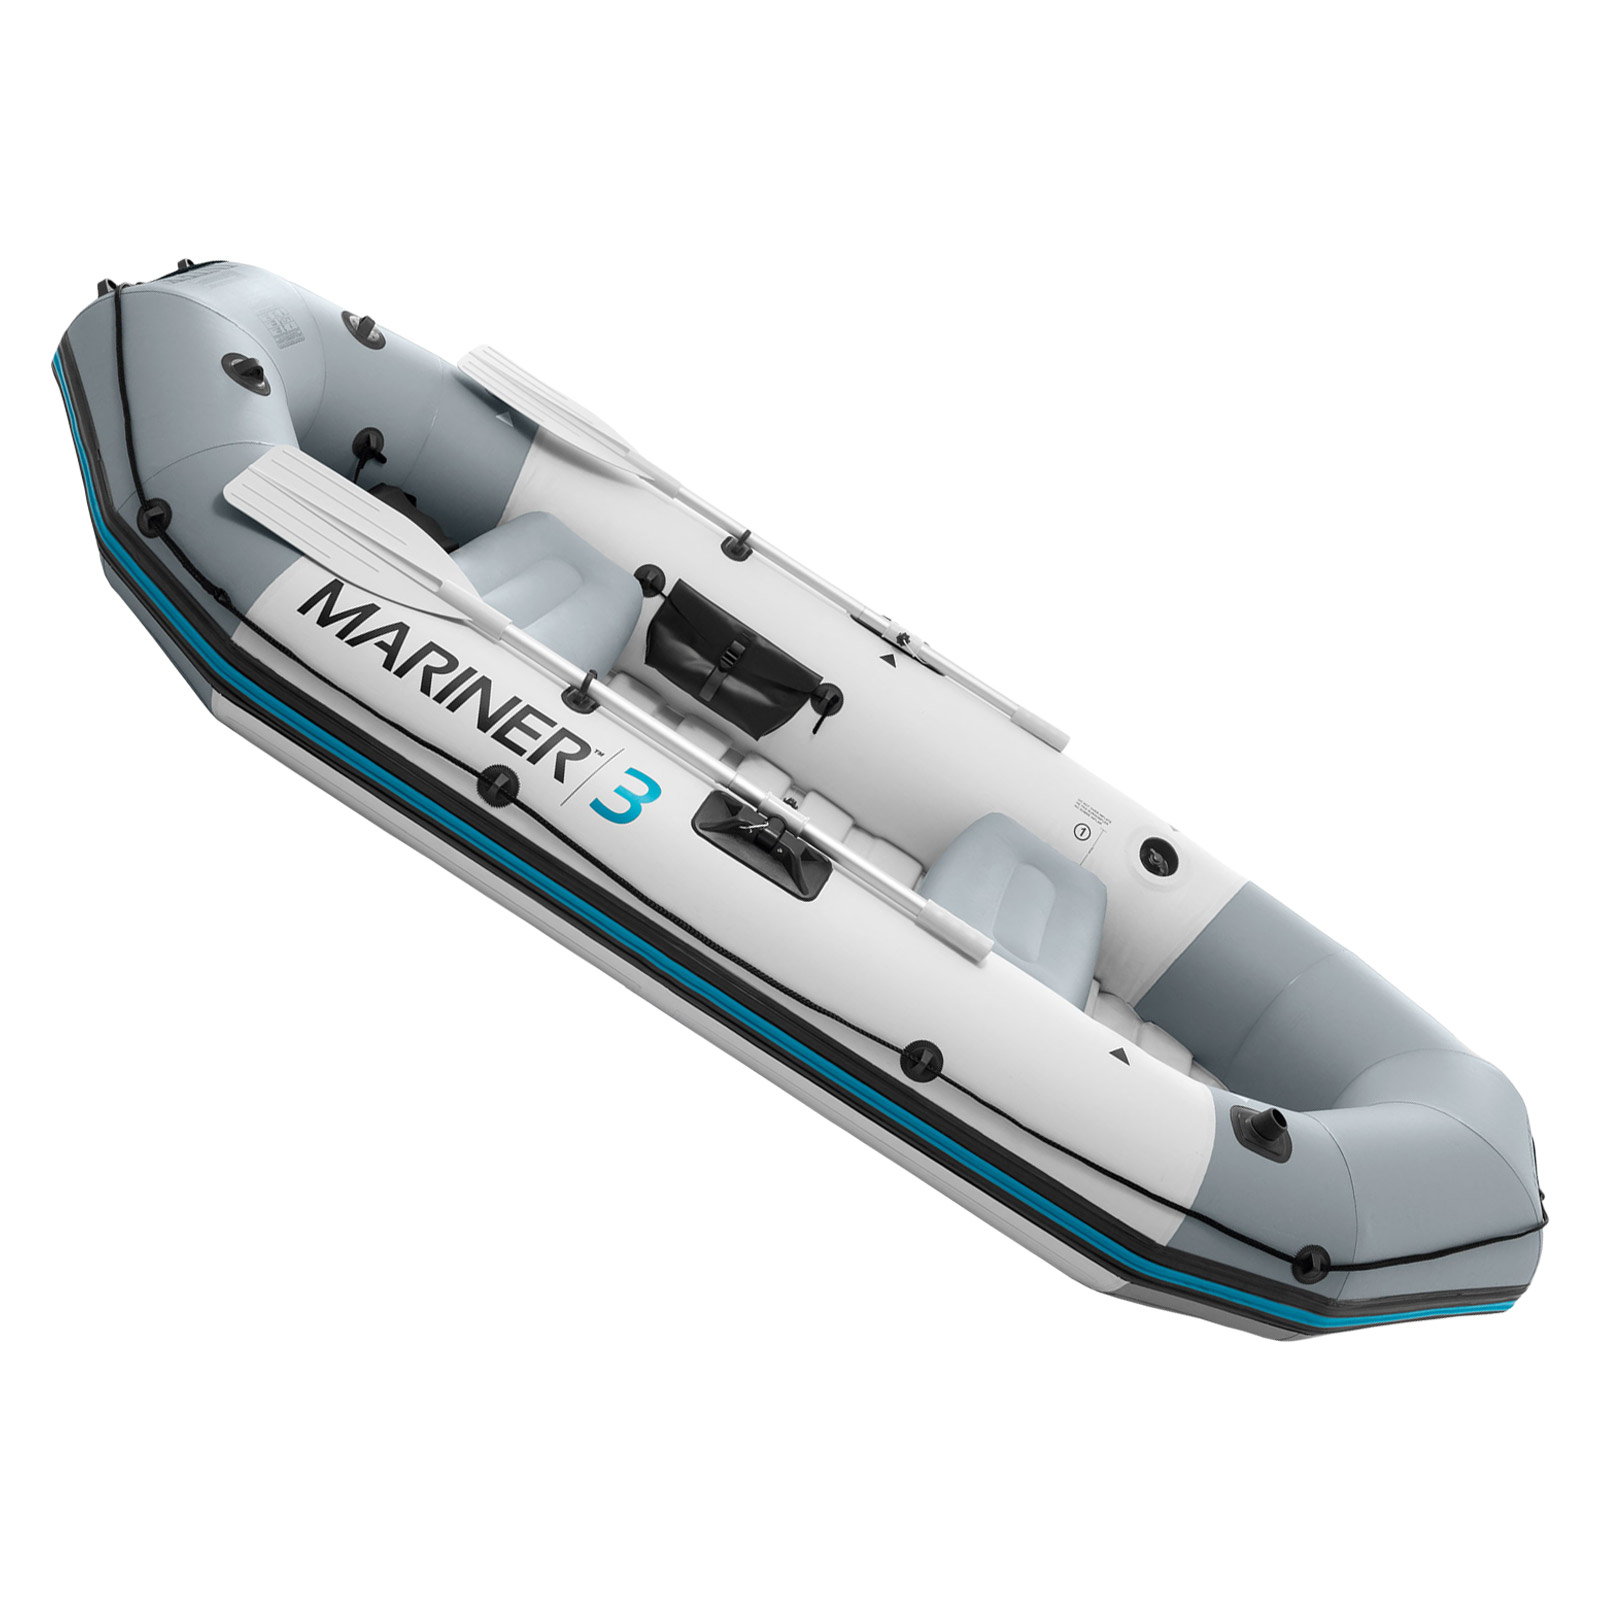 Intex 68373 Boot Schlauchboot Angelboot Aufr Motorboot Mariner 3